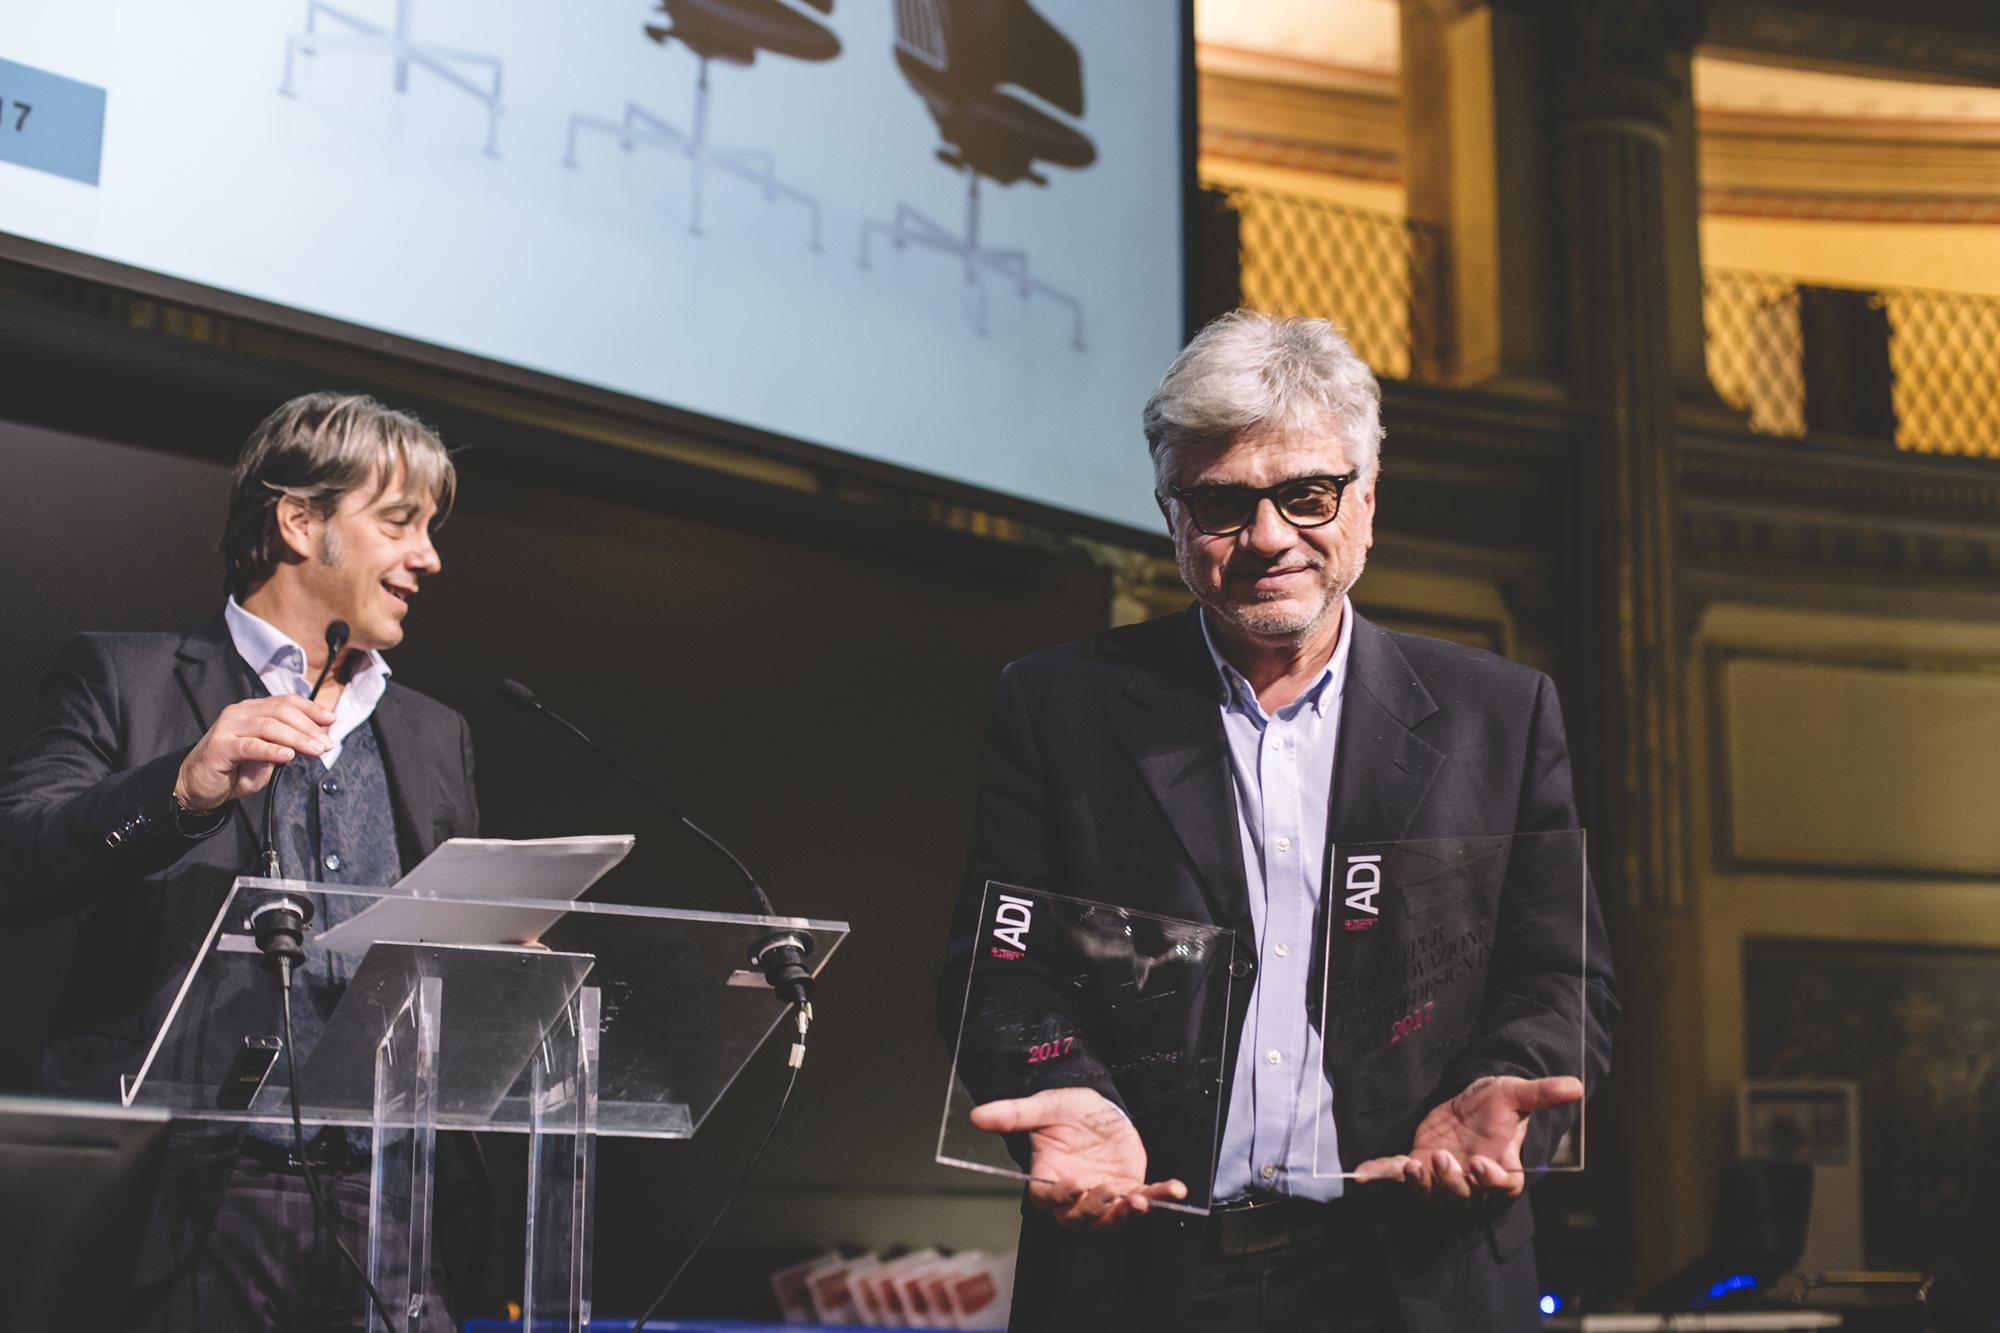 More ADI awards for iGuzzini